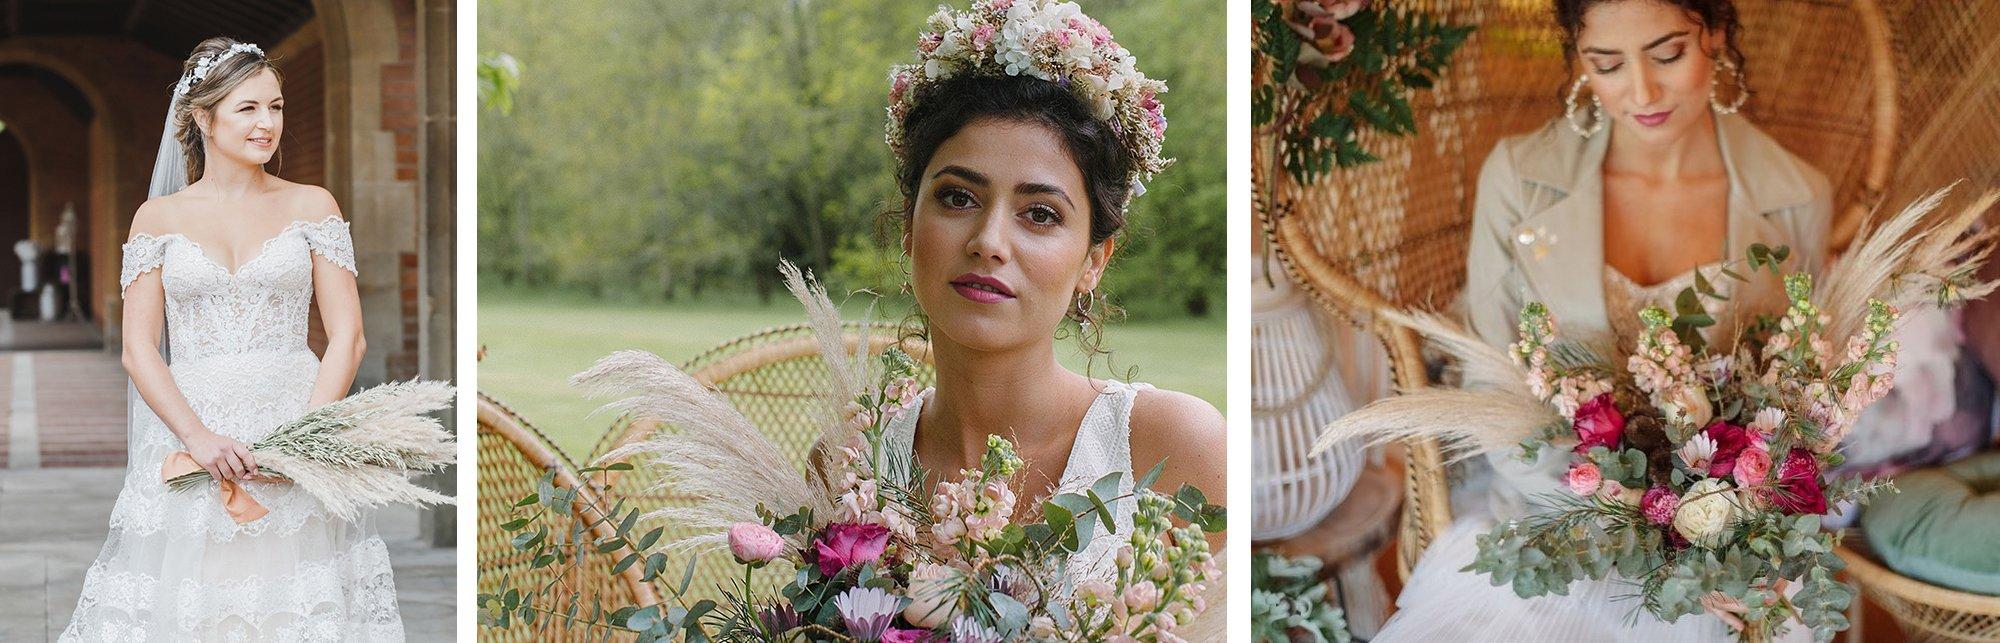 Stunning Pampas Grass Bouquets | Flamboyant Invites